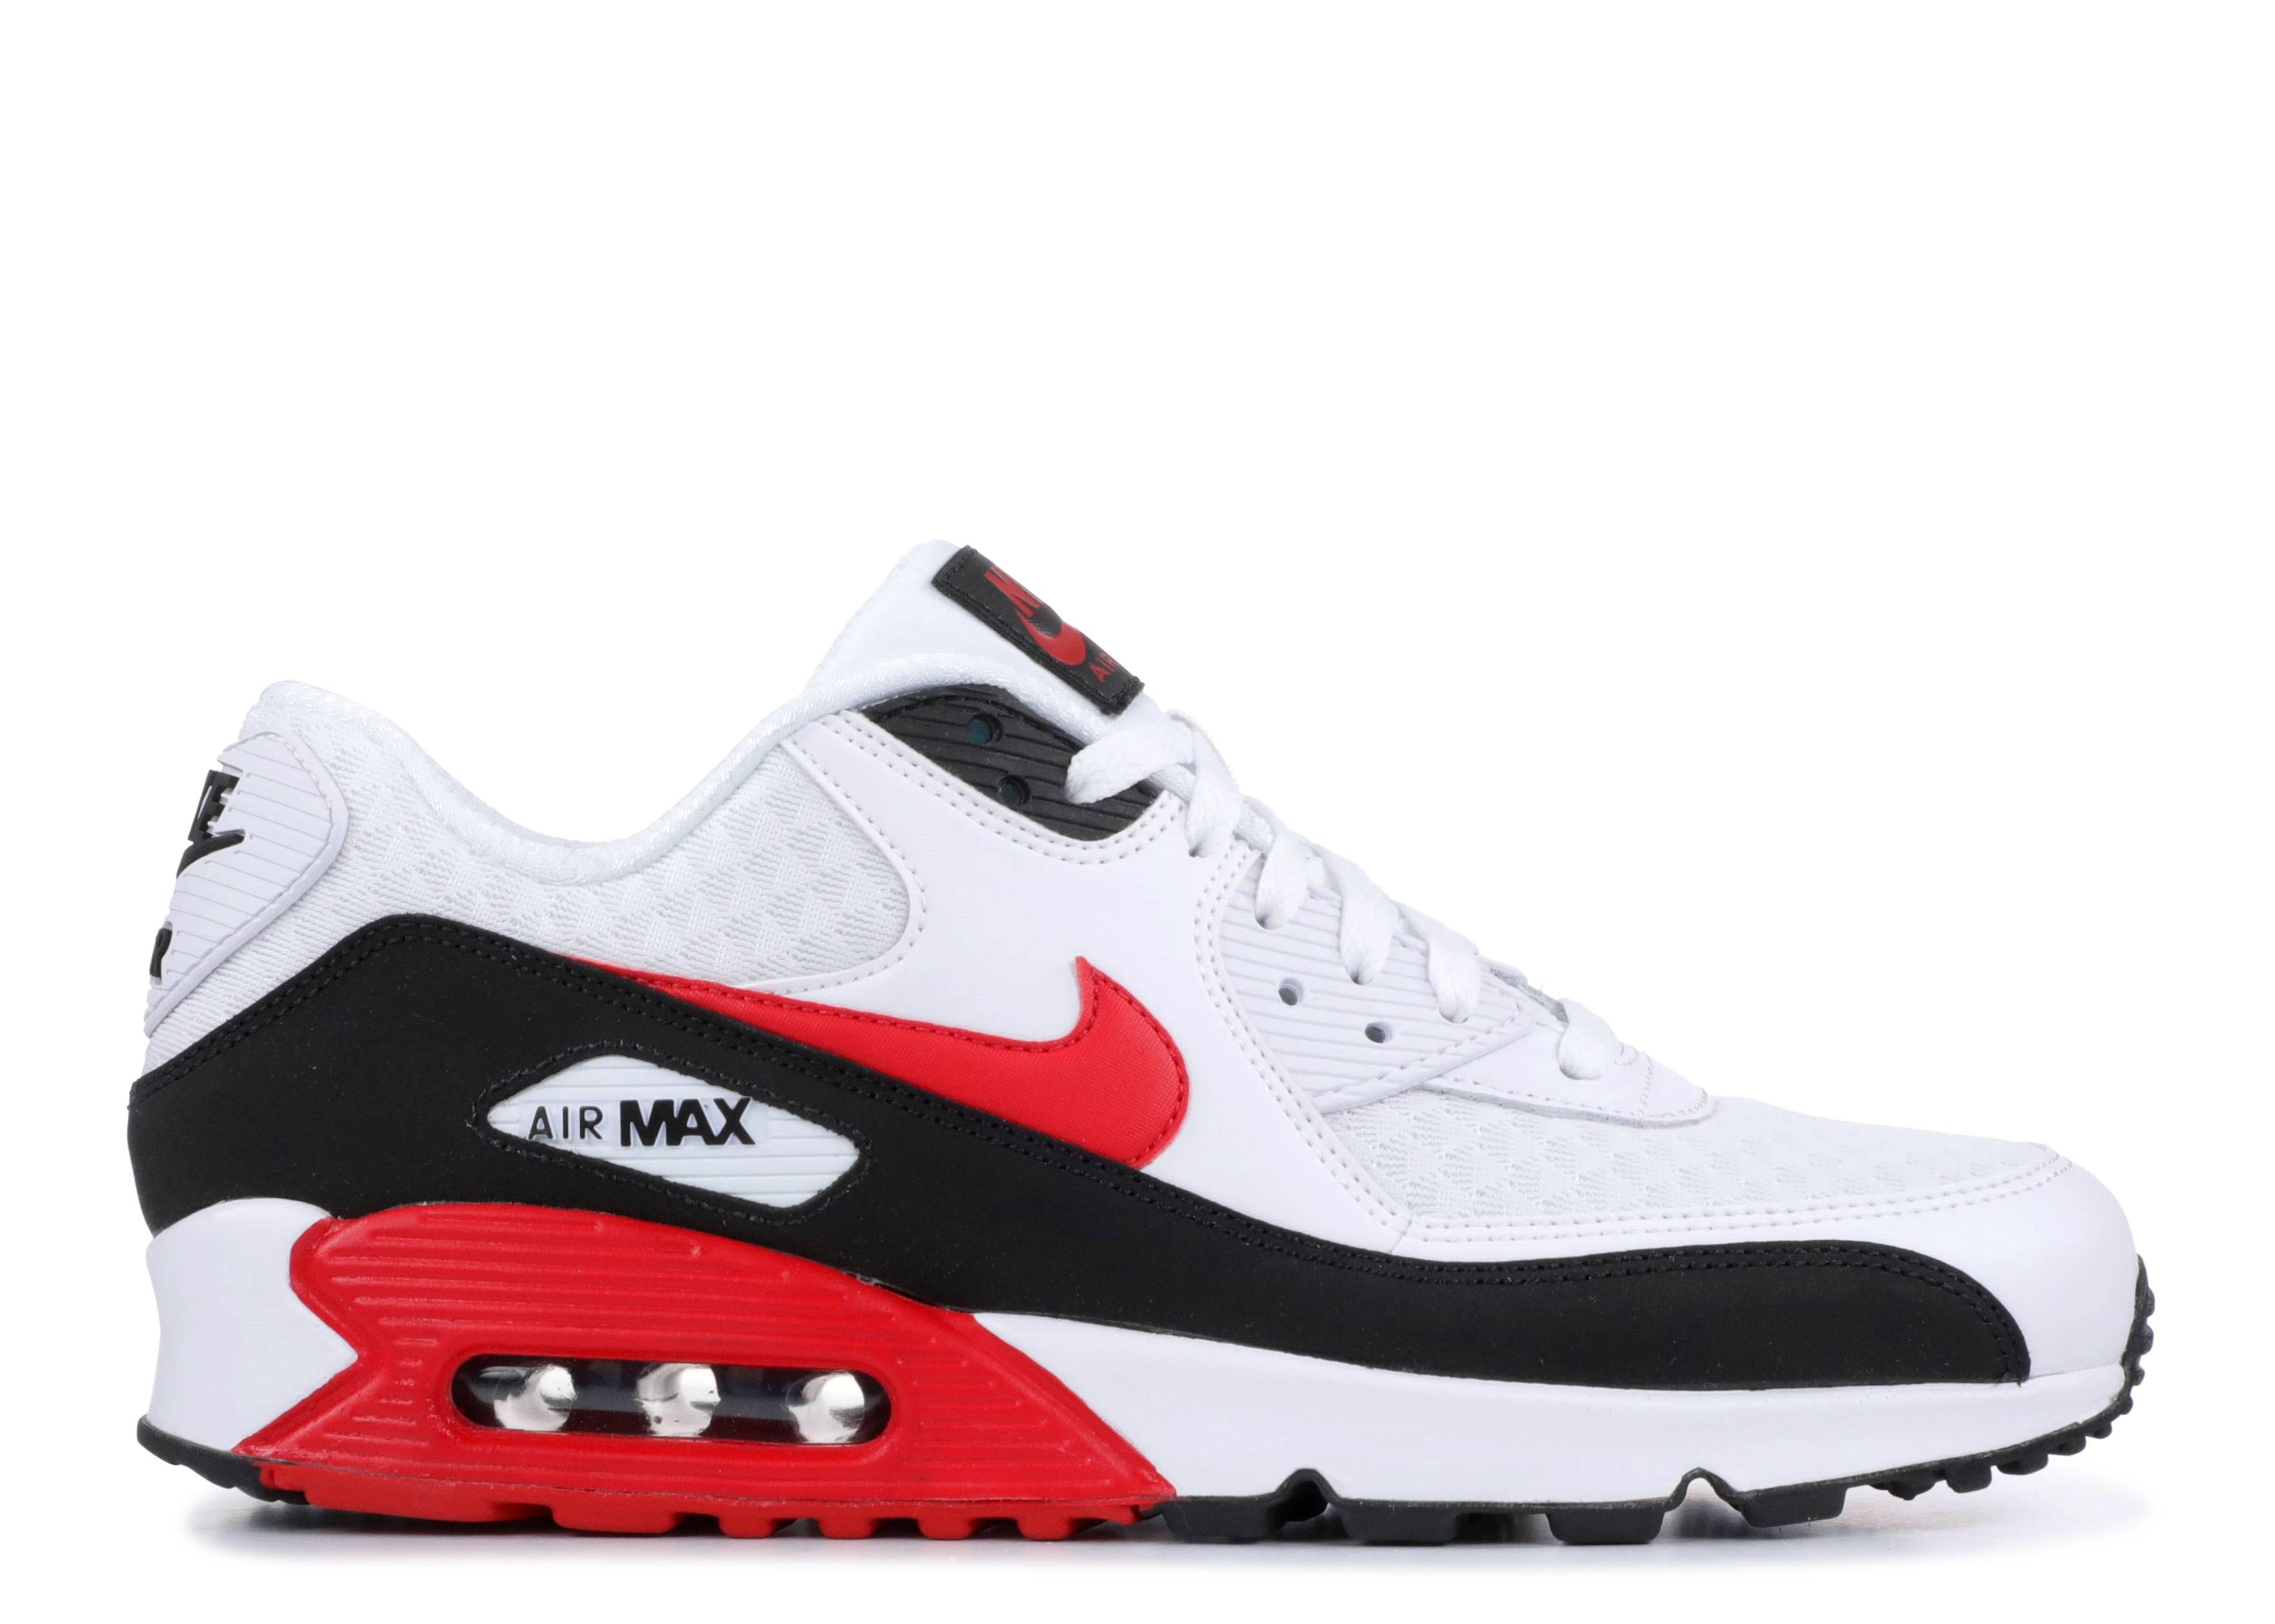 abfe81d698 Nike Air Max 90